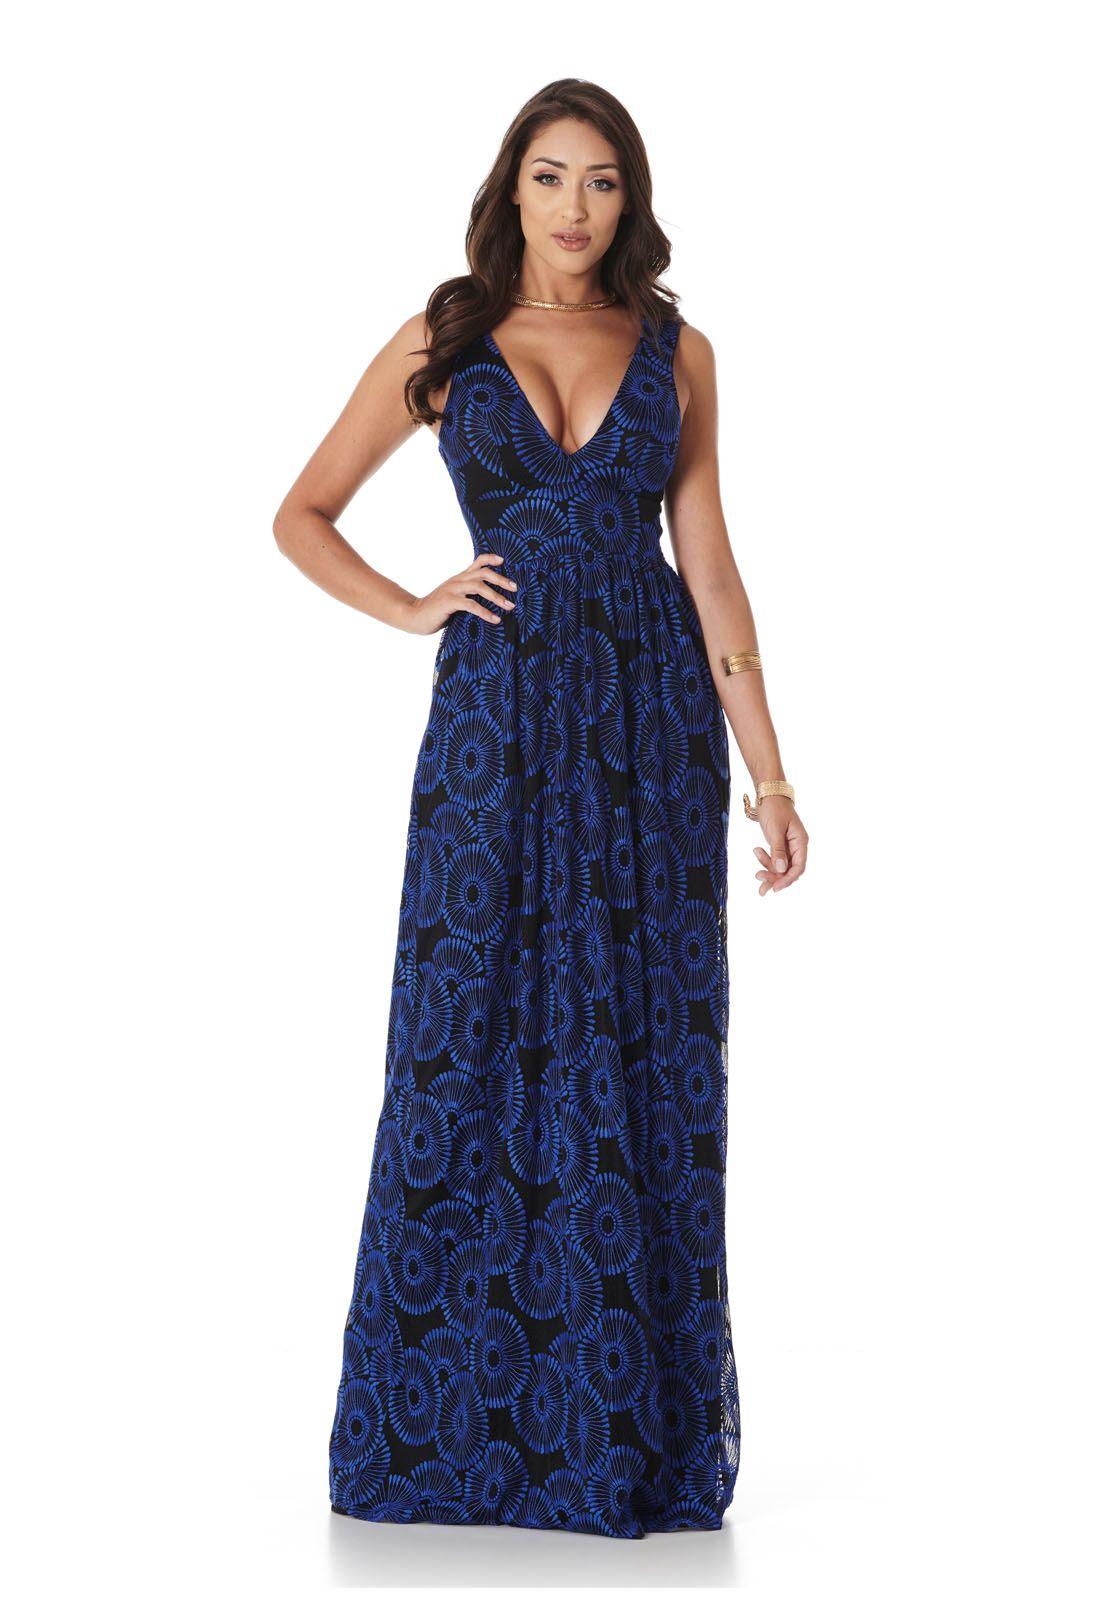 Vestido Longo Renda Nouveau Azul Lala Dubi